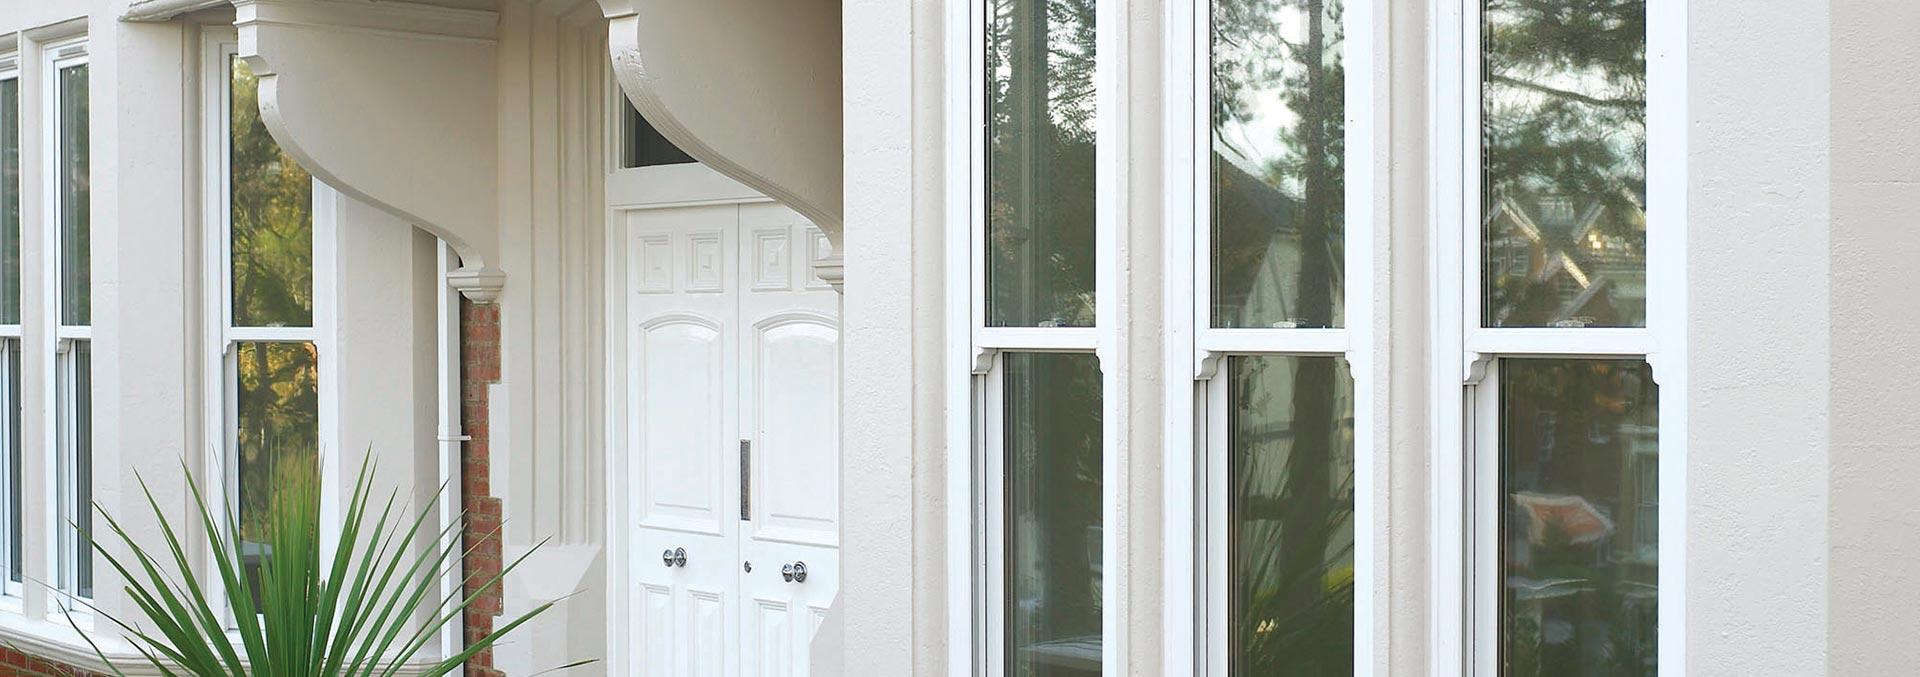 uPVC sliding sash windows in white